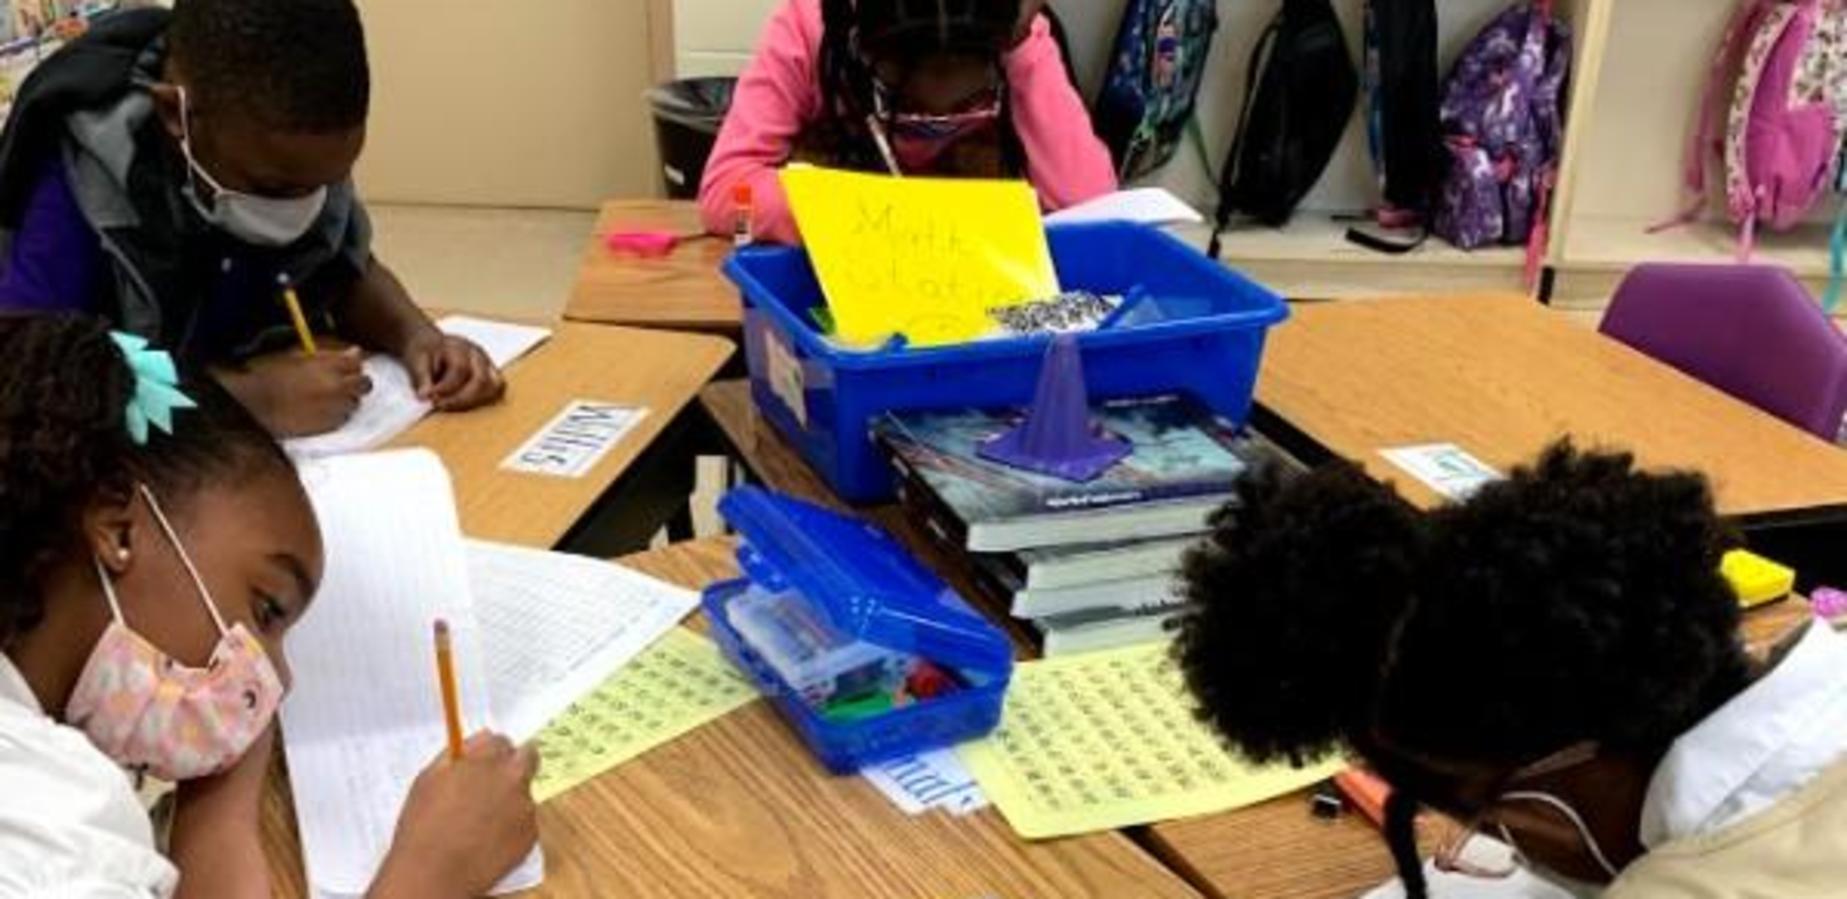 2nd graders writing